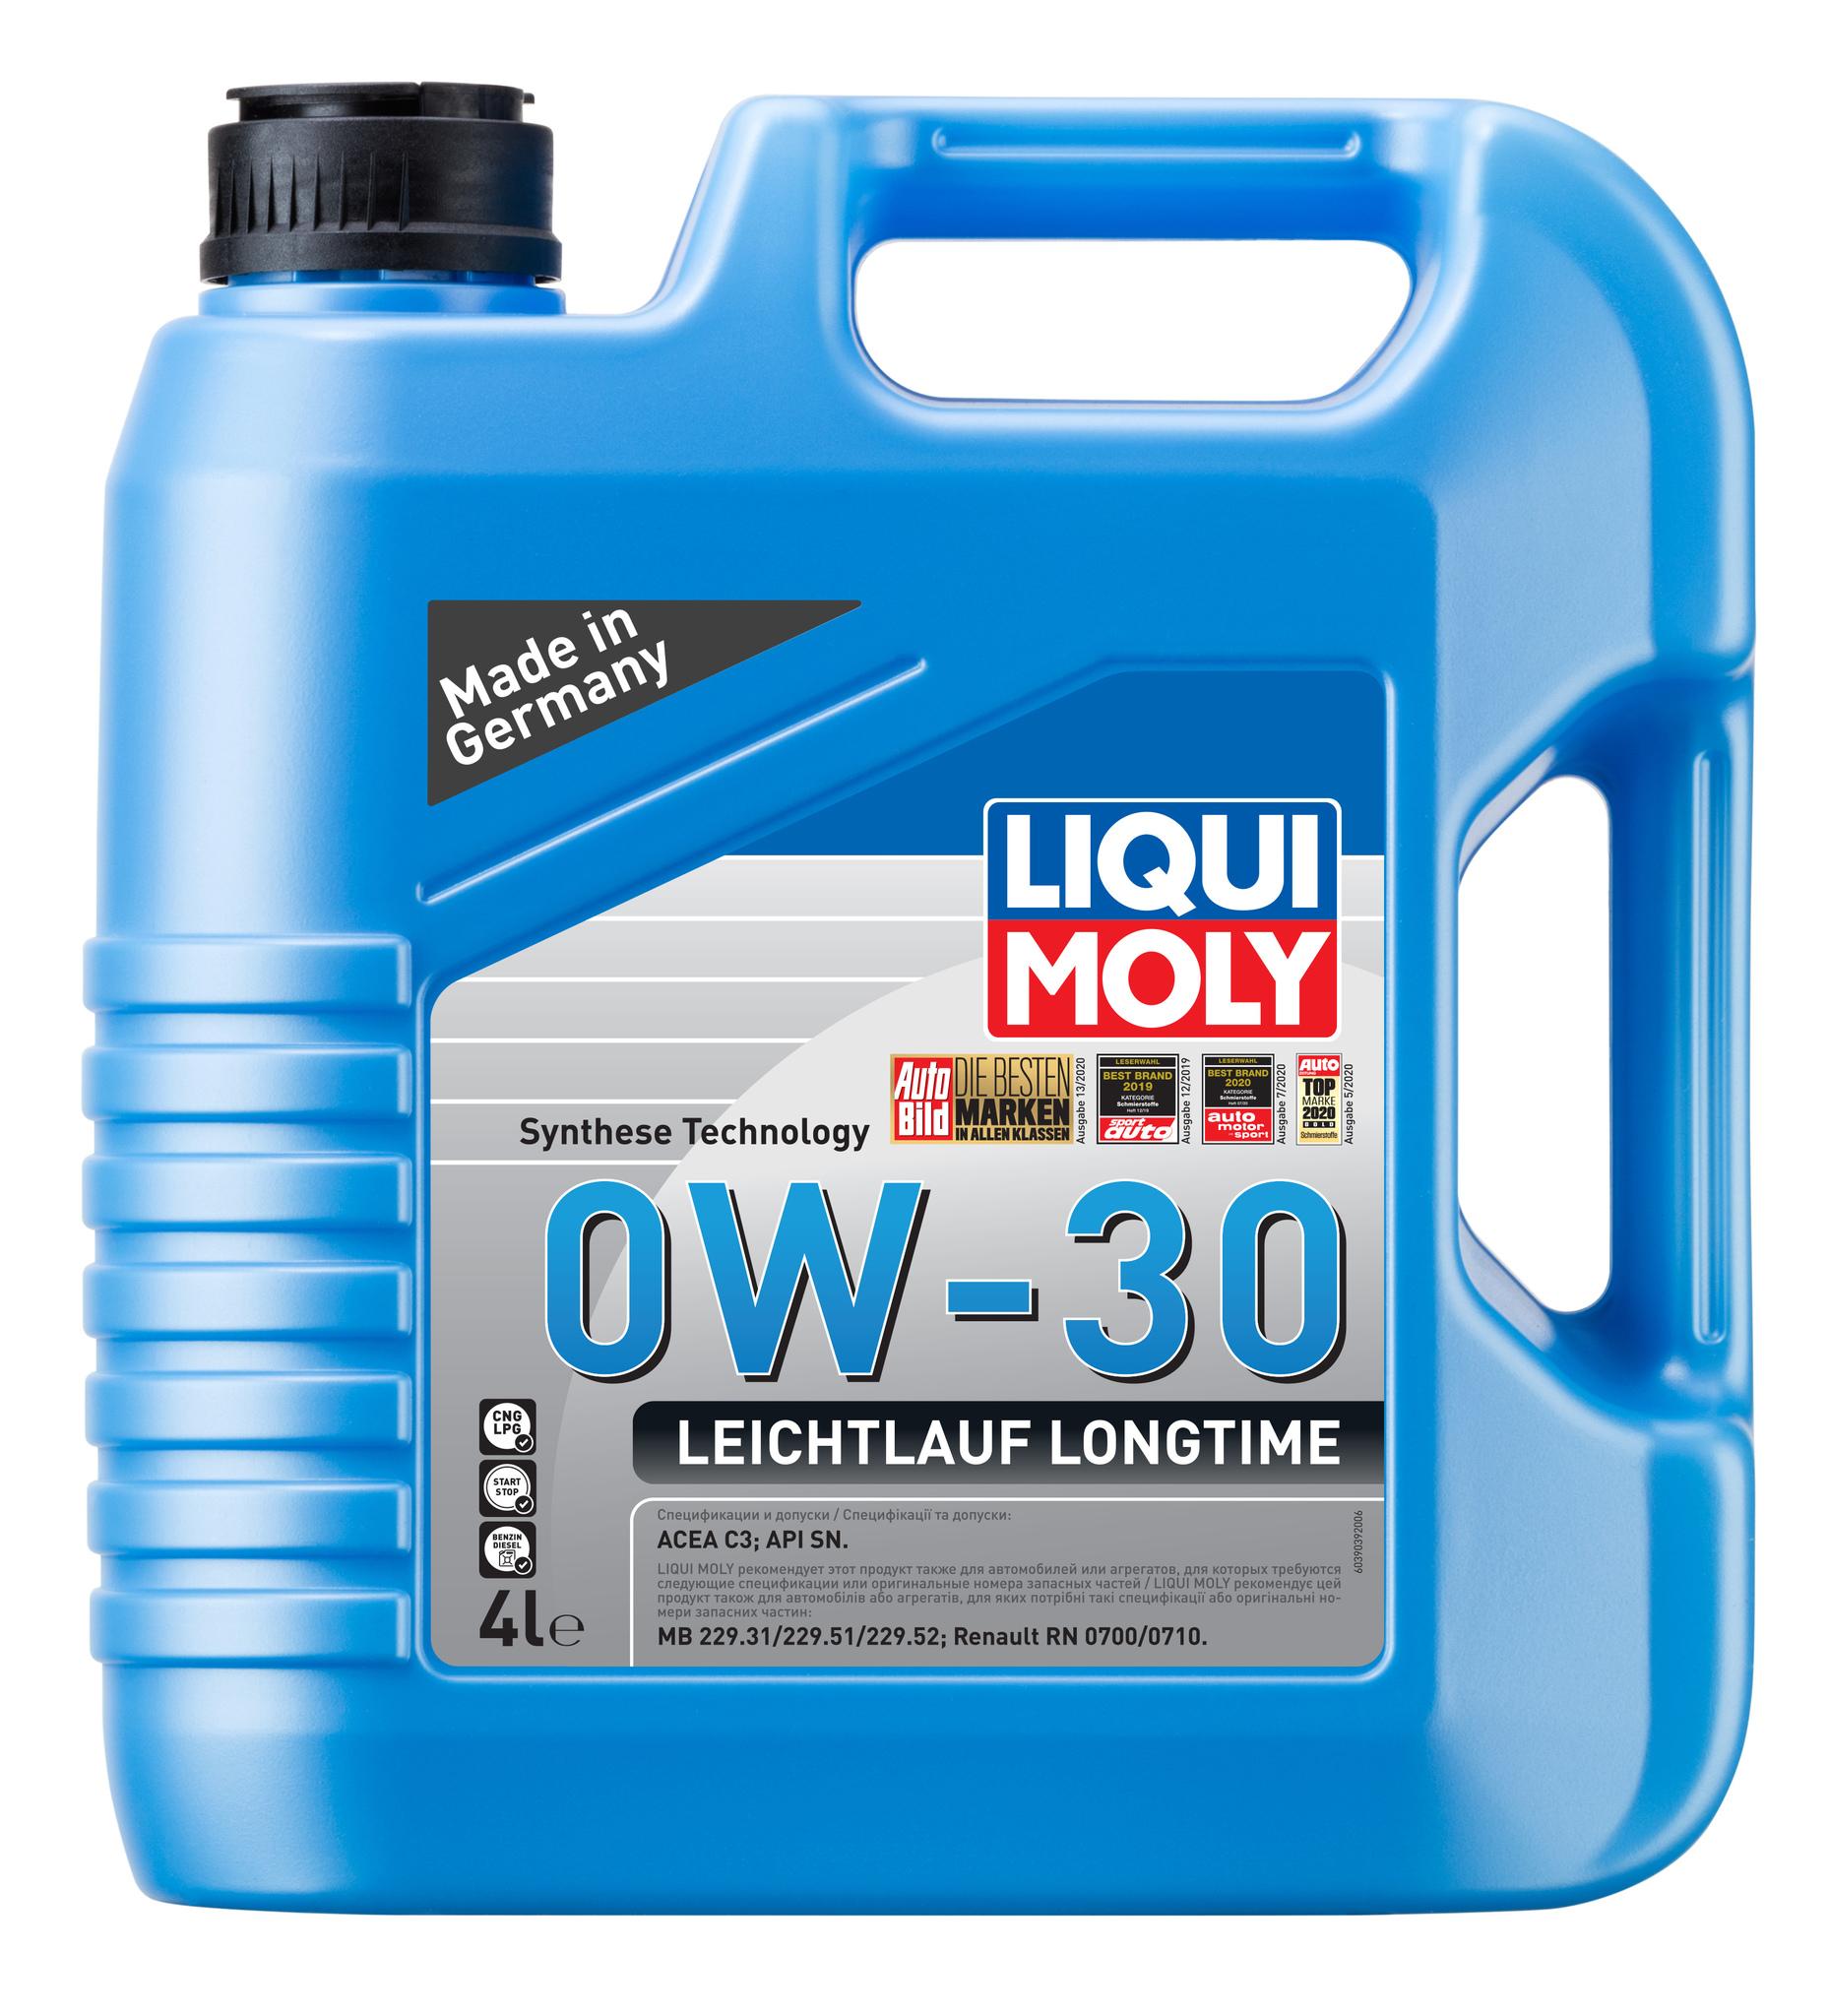 Liqui Moly Leichtlauf Longtime 0W30 НС-синтетическое моторное масло